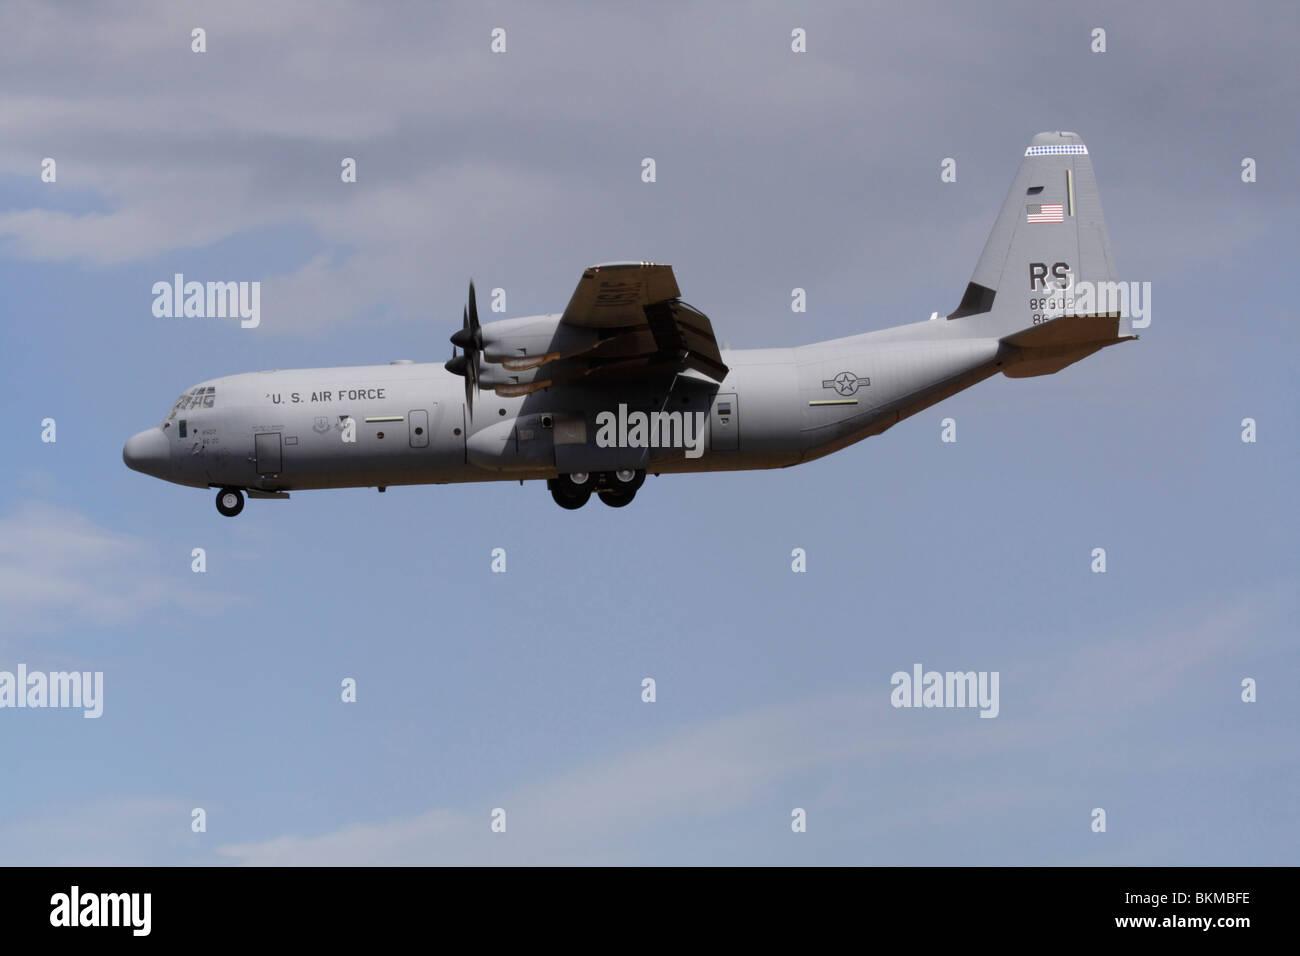 US Air Force Lockheed Martin C-130J-30 Hercules cargo plane. Military air transport. - Stock Image